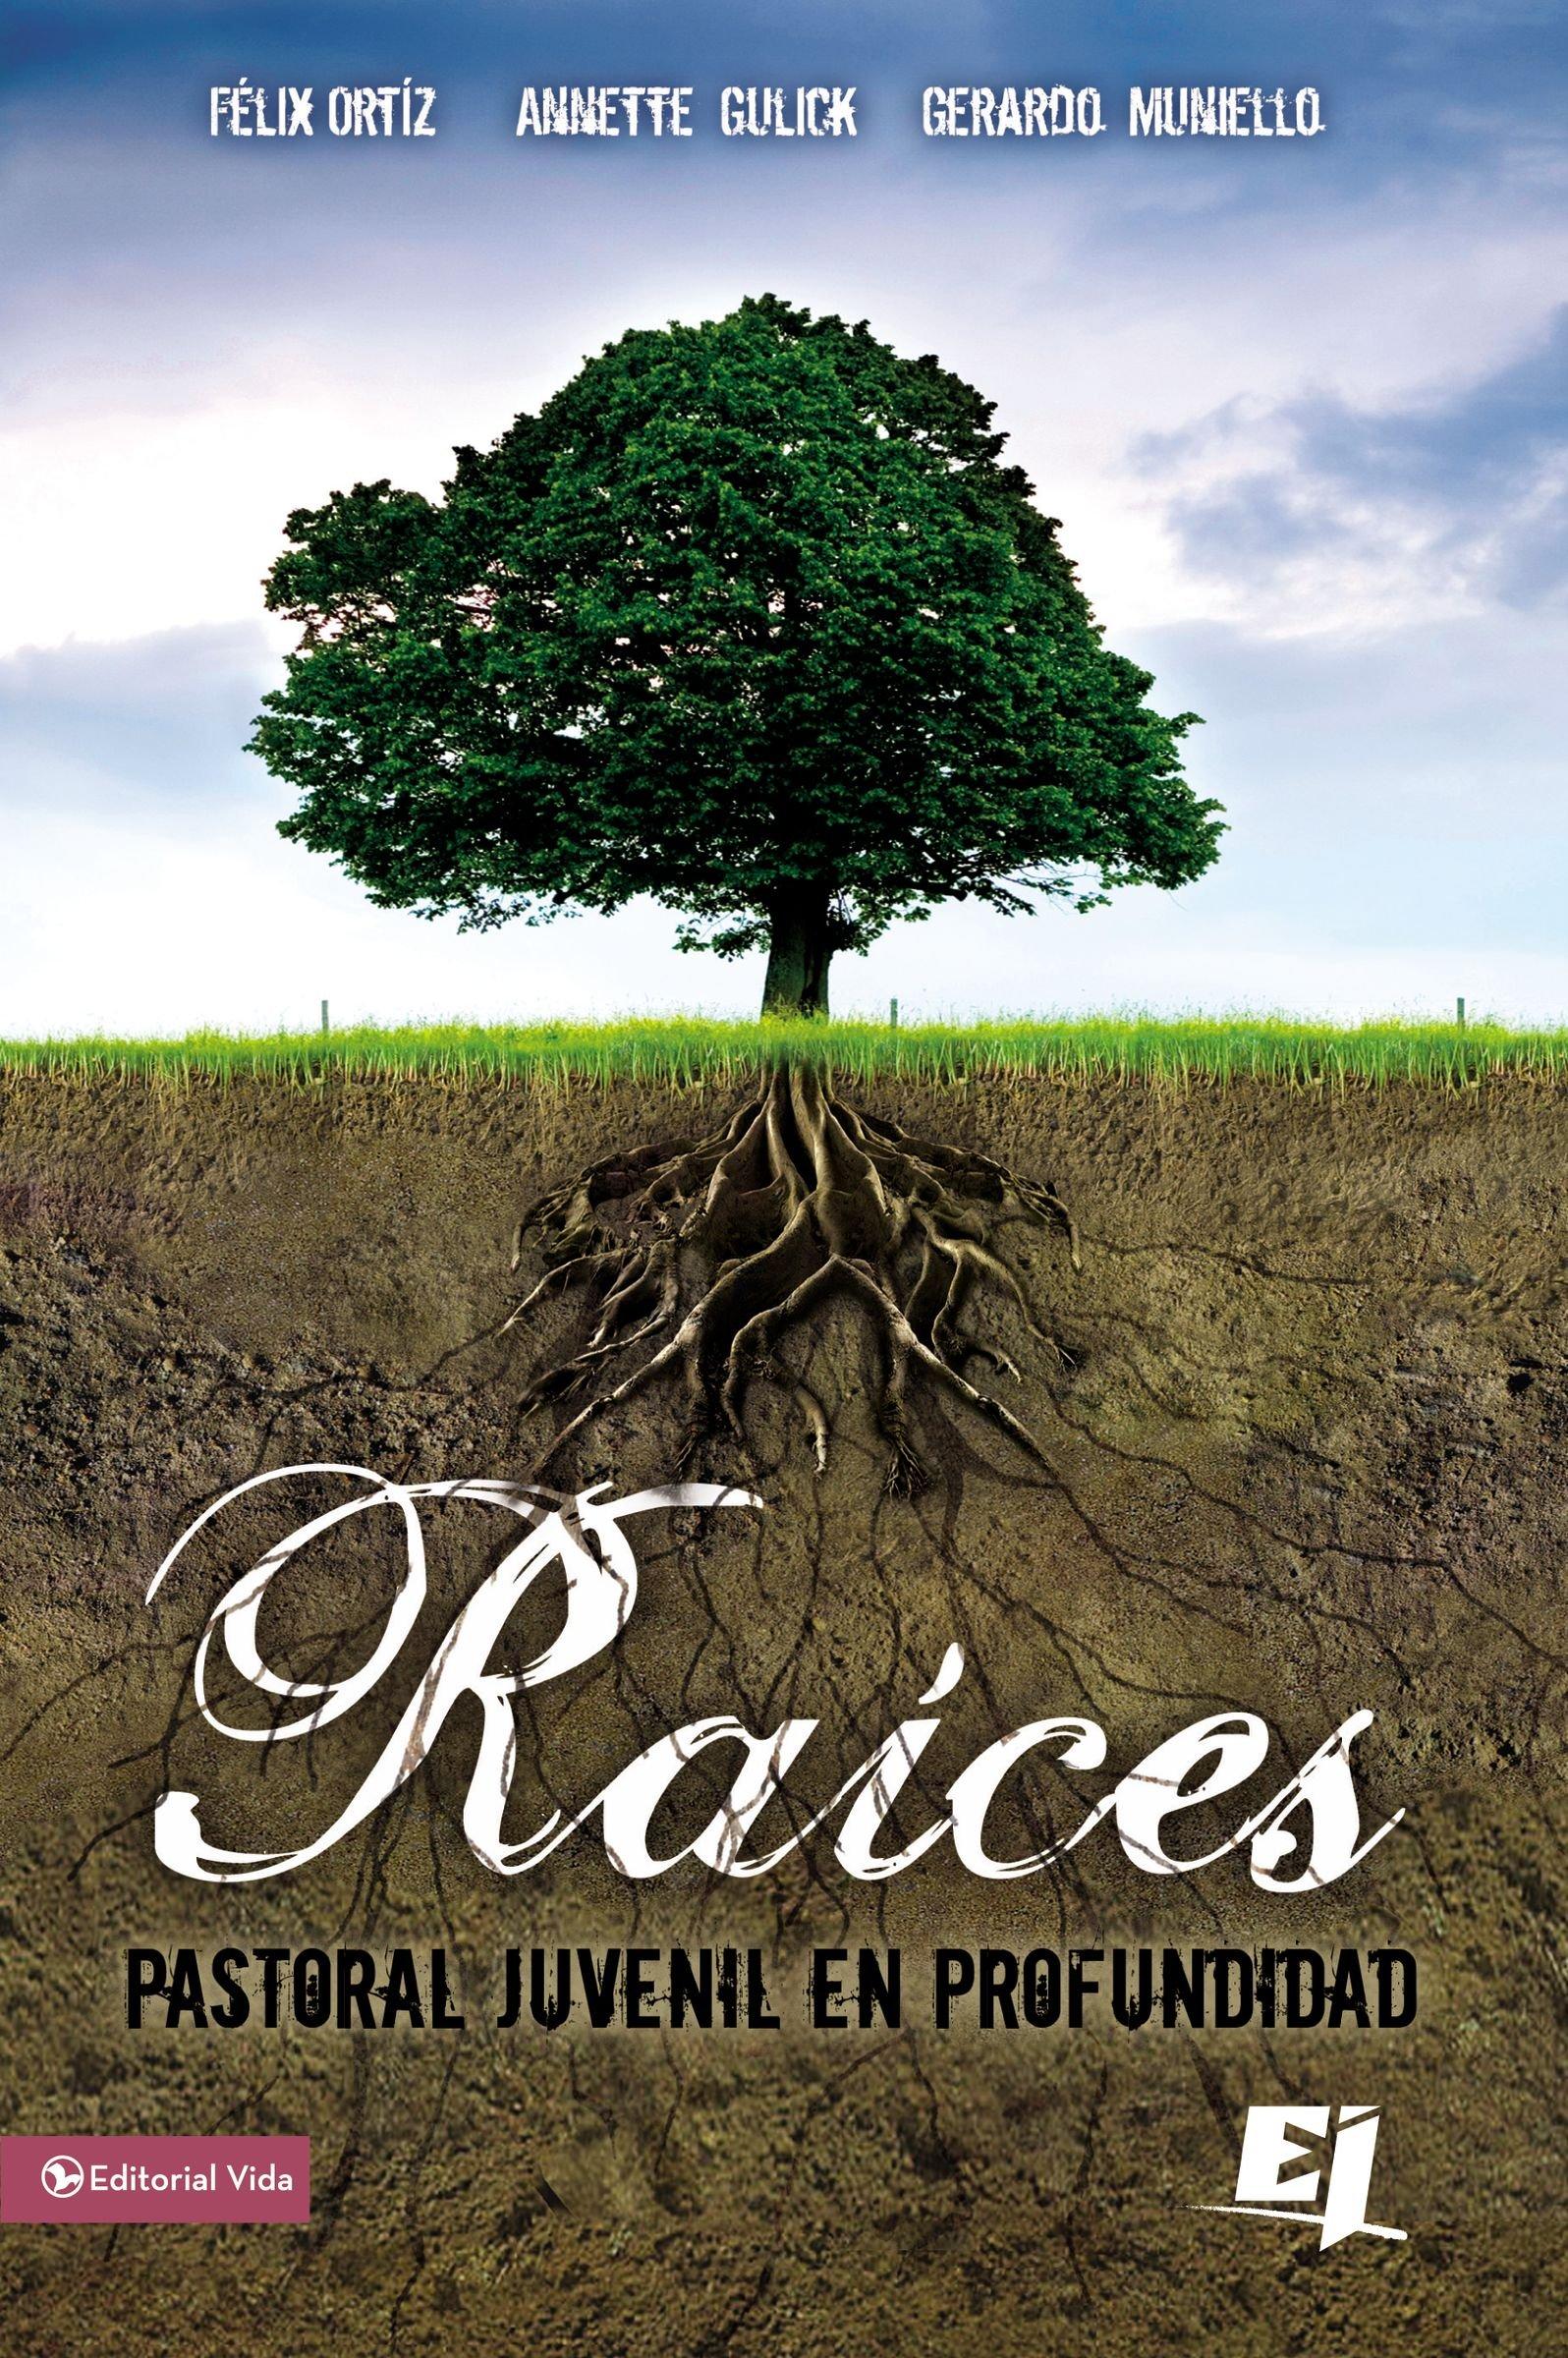 Raíces: Pastoral juvenil en profundidad (Especialidades Juveniles) (Spanish Edition): Felix Ortiz, Annette Gulick, Gerardo Muniello: 9780829750065: ...